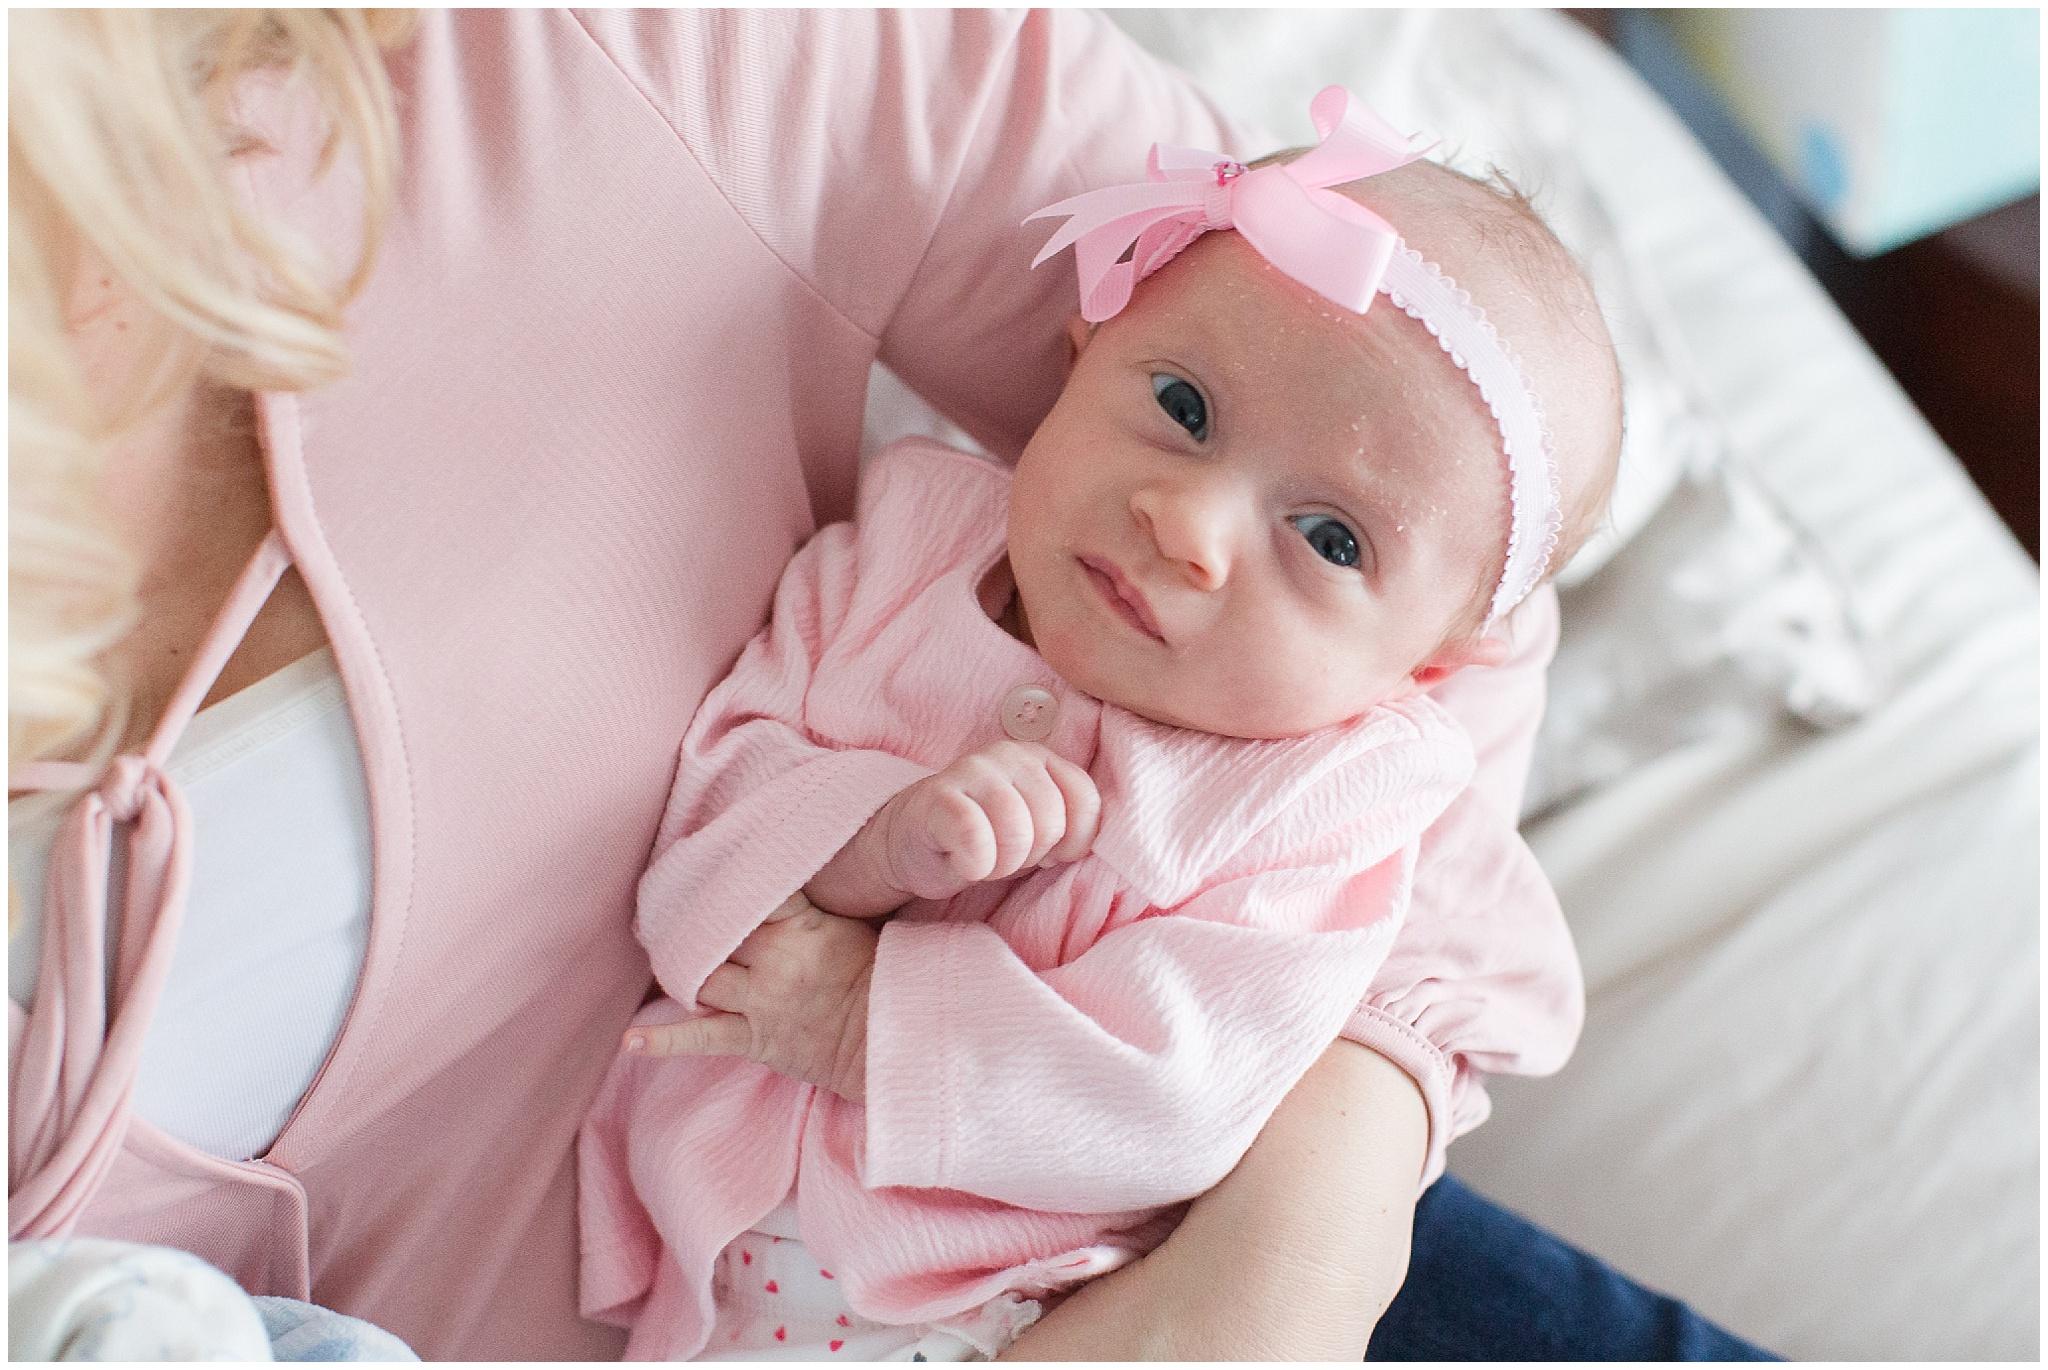 newborn_twins_photography_Gadgil_0009.jpg